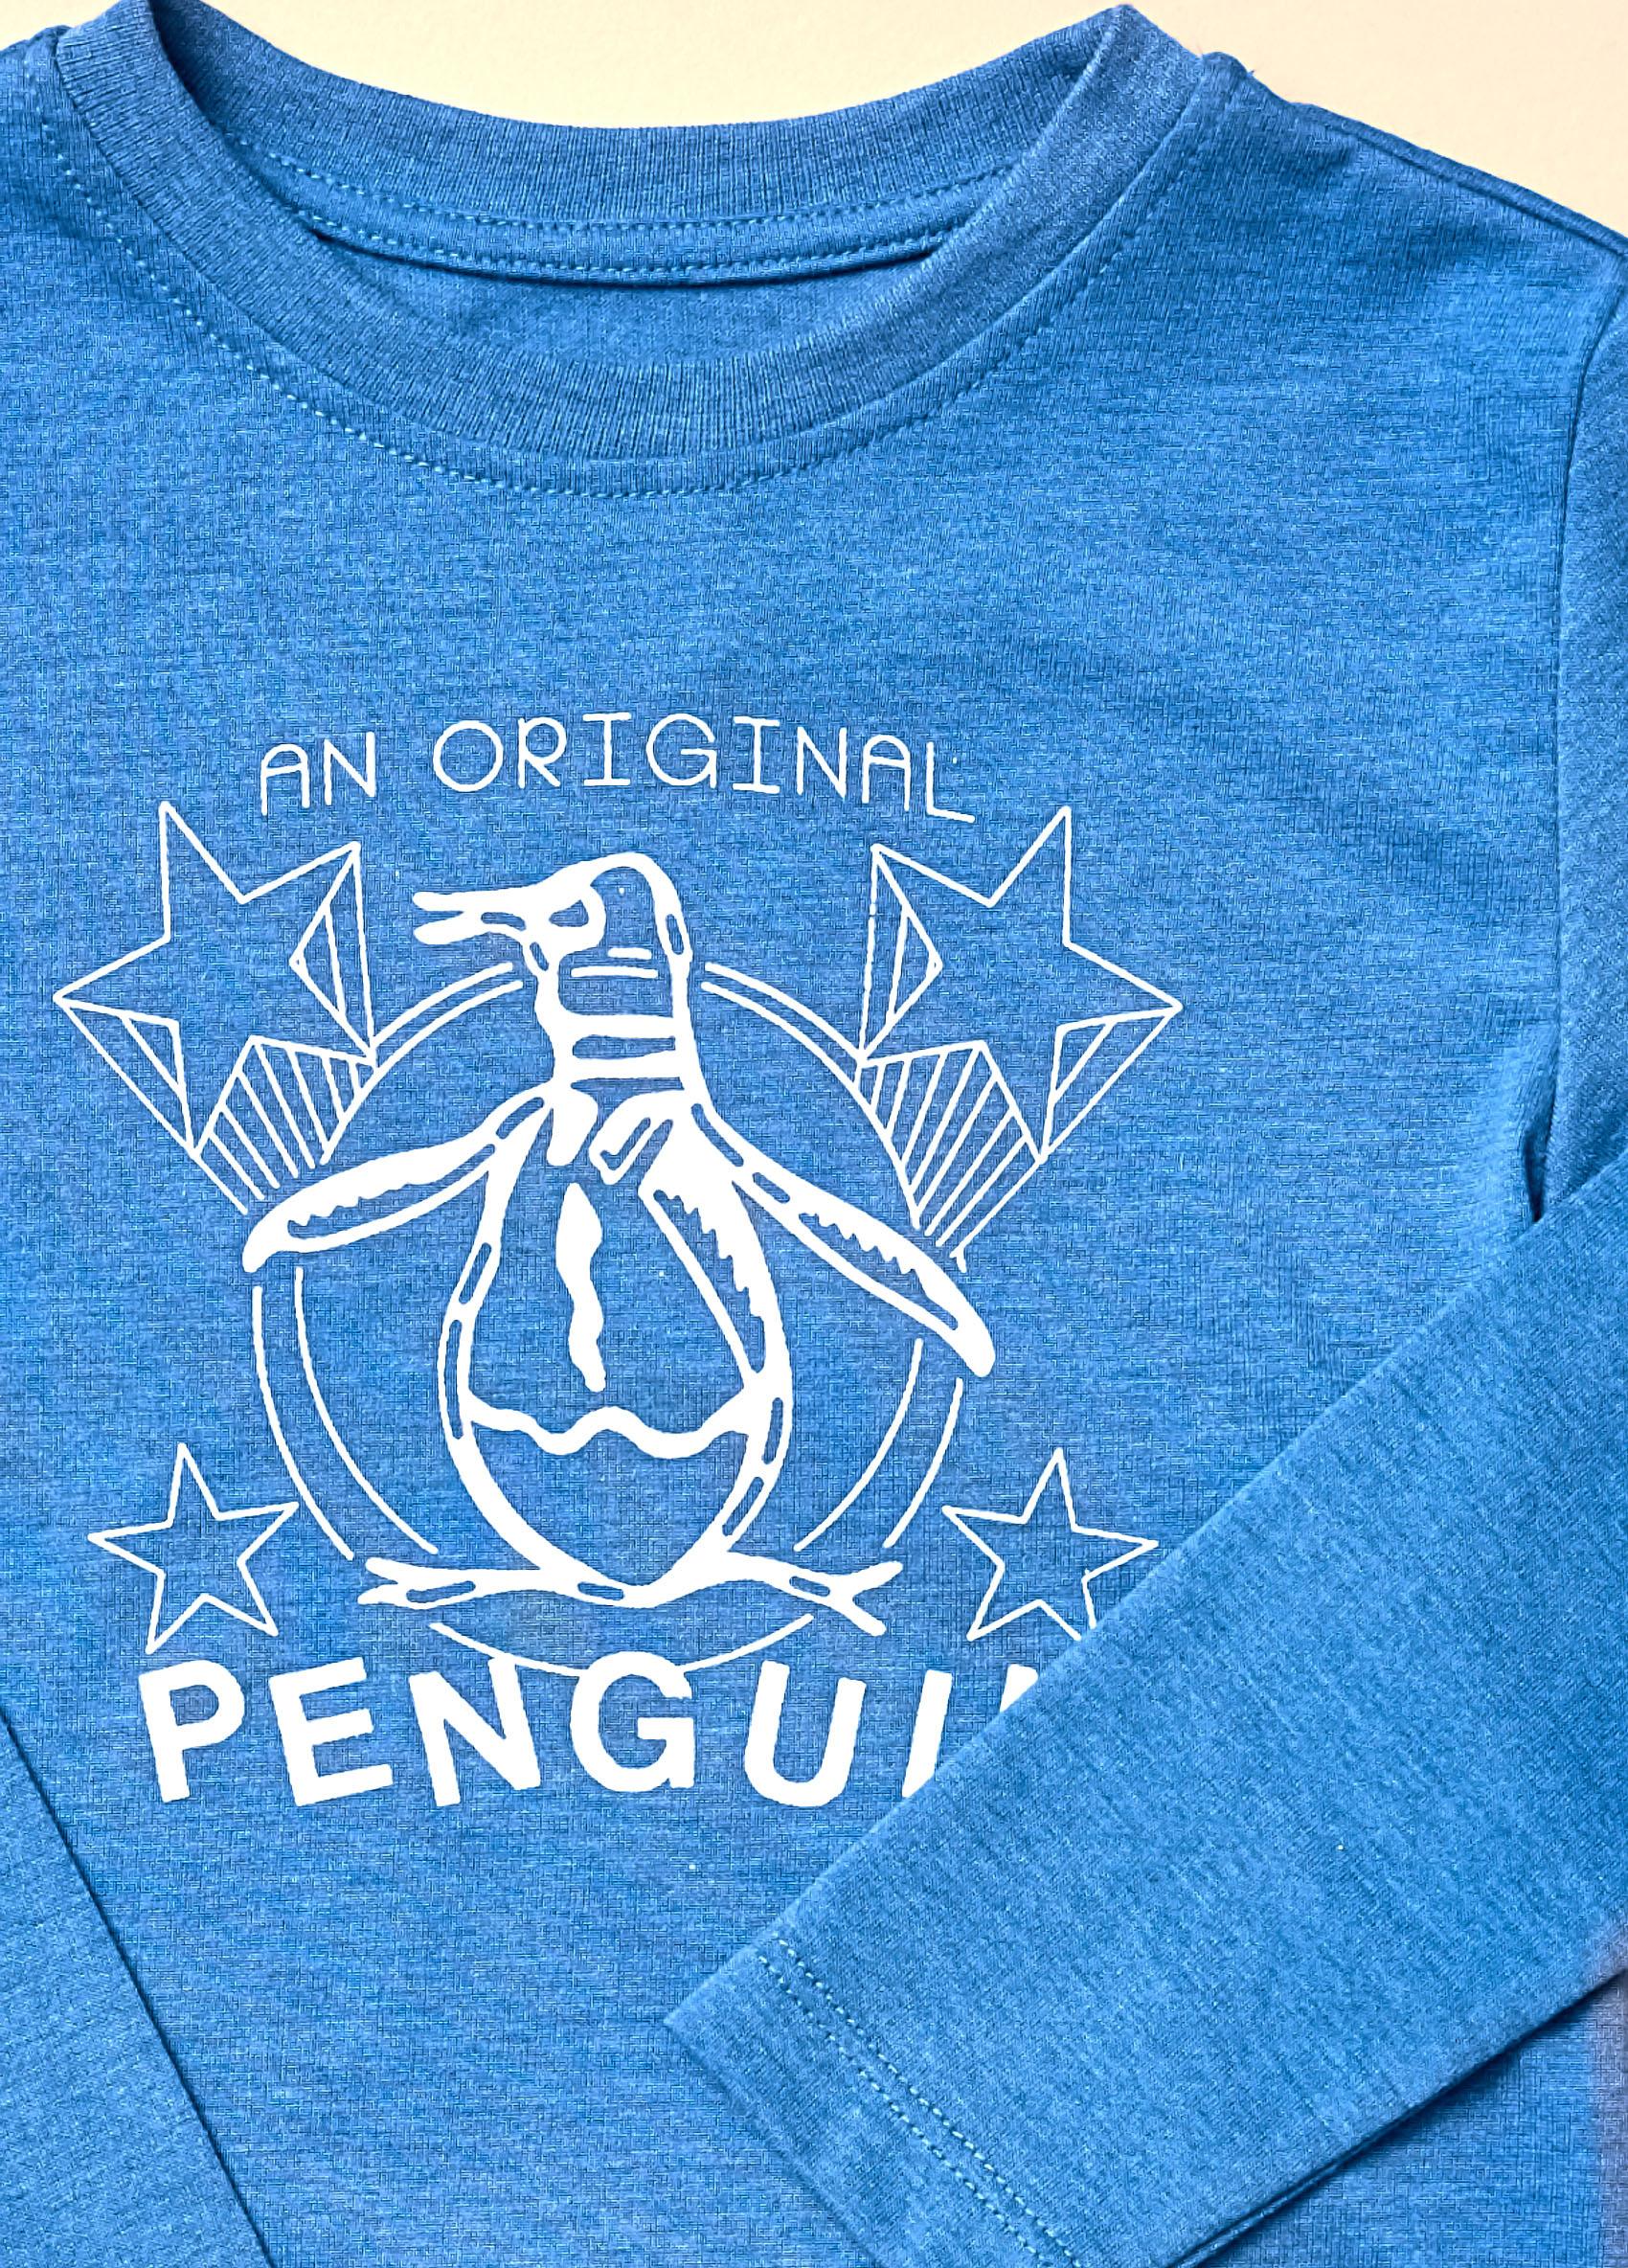 penguin_ls-poster-pete_21-08-2020__picture-10033